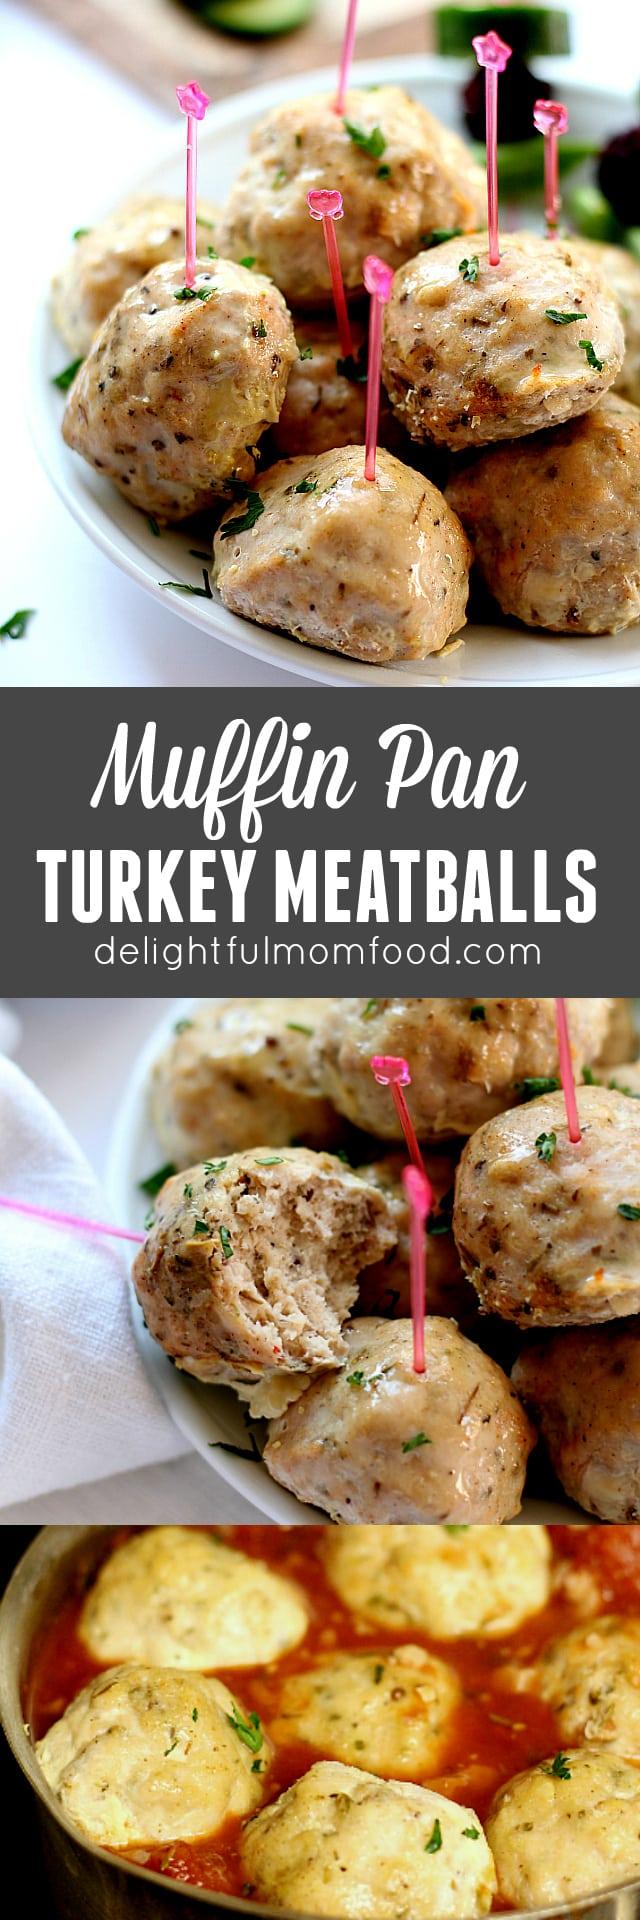 Easiest baked Meatballs recipe